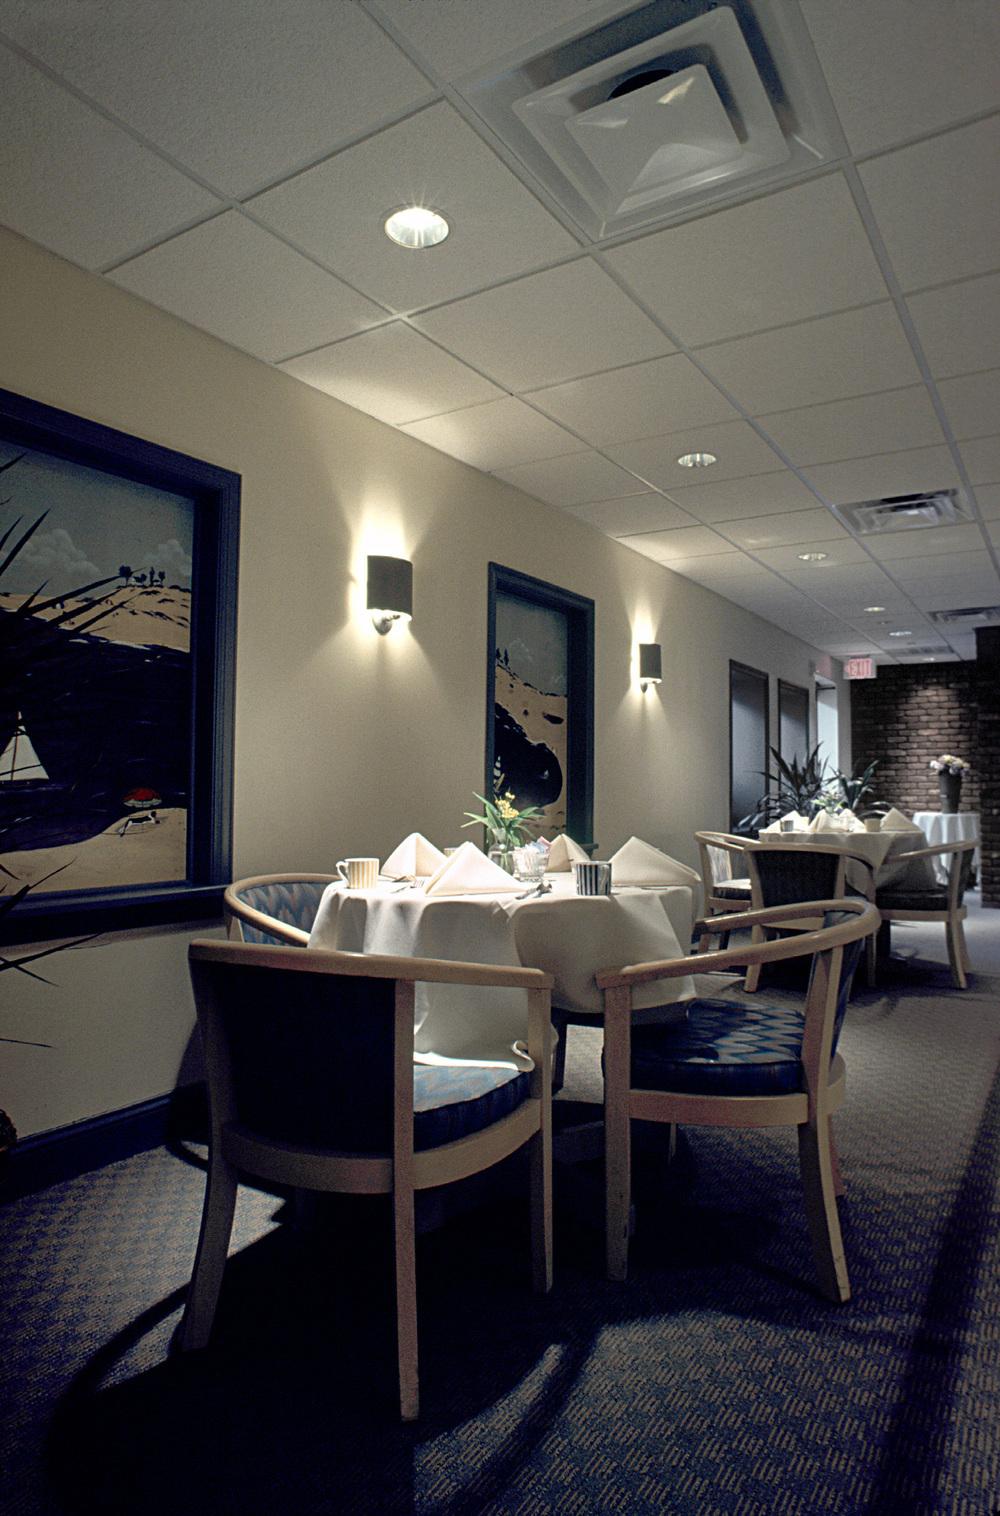 Southhamton Inn. Tobin Parnes Design. NY. Hospitality Design. Dining Area.